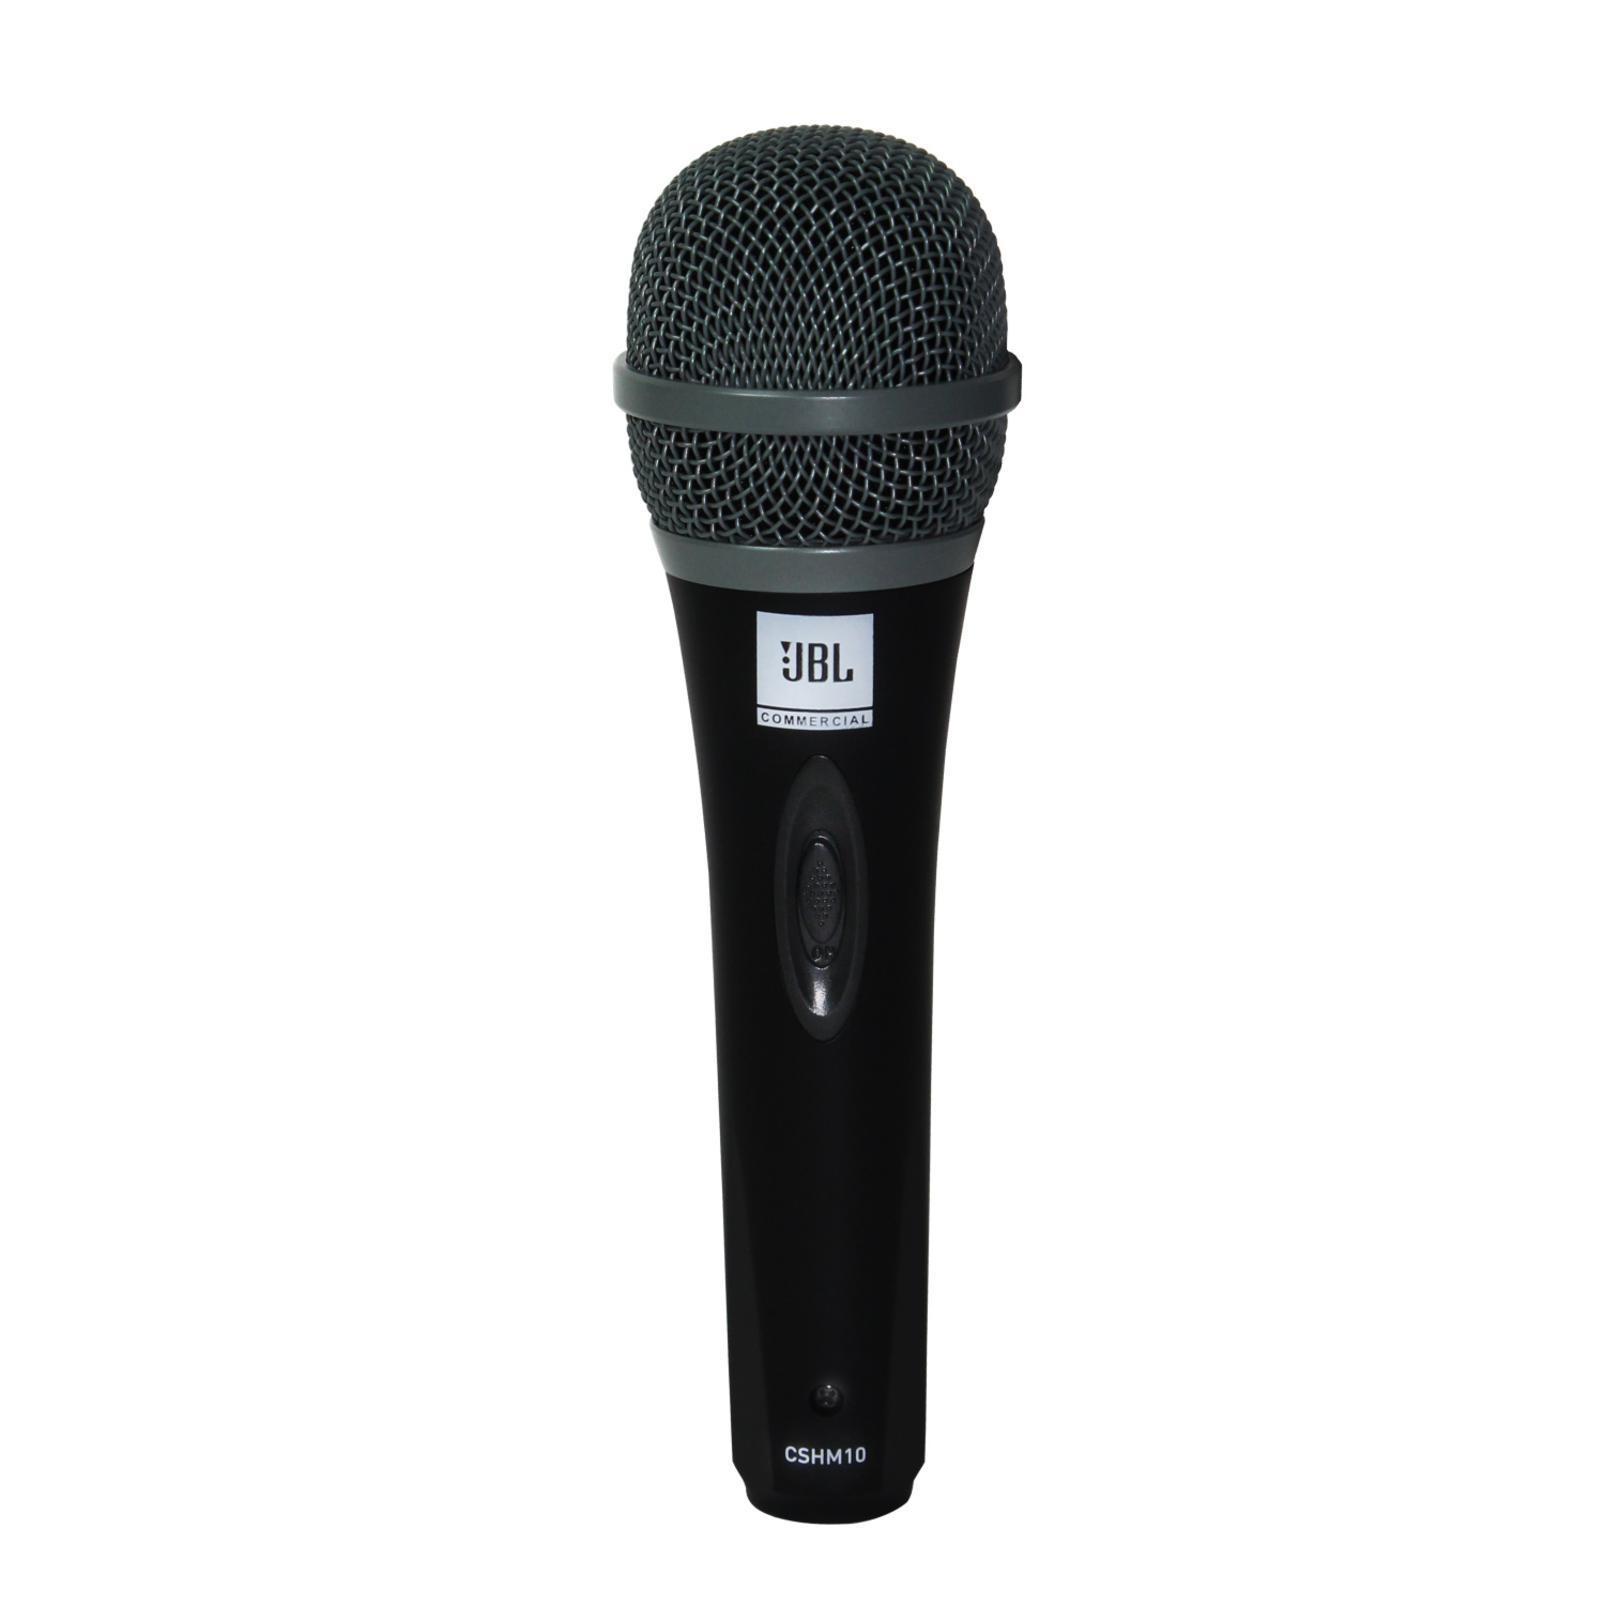 JBLCSHM10 - Black - Handheld Dynamic Vocal Microphone - Hero